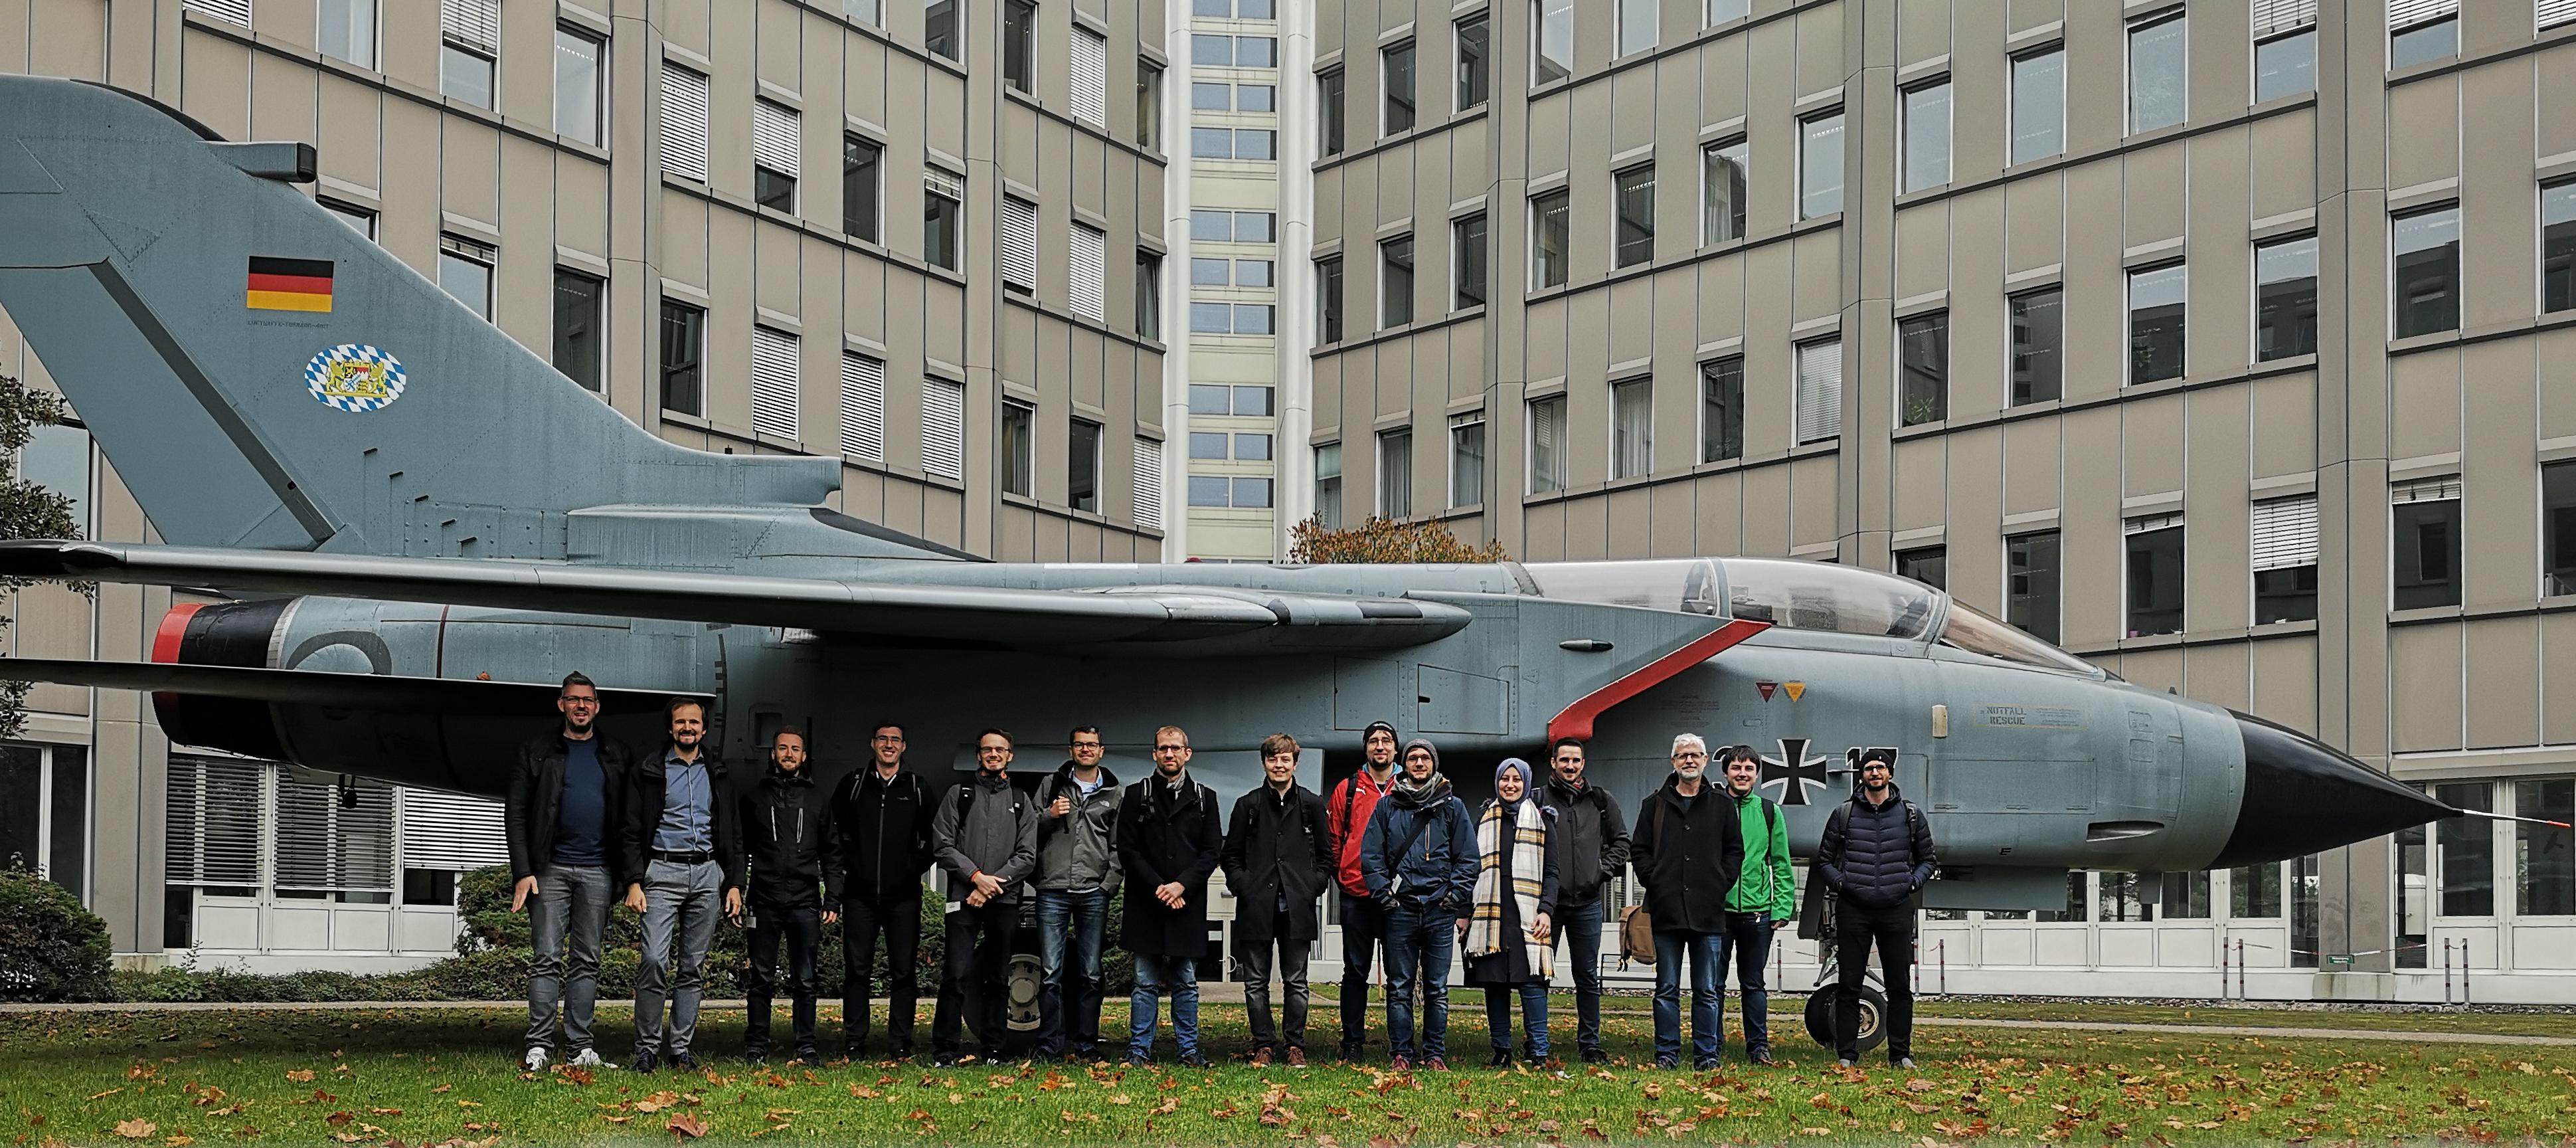 Integrationsworkshop in München